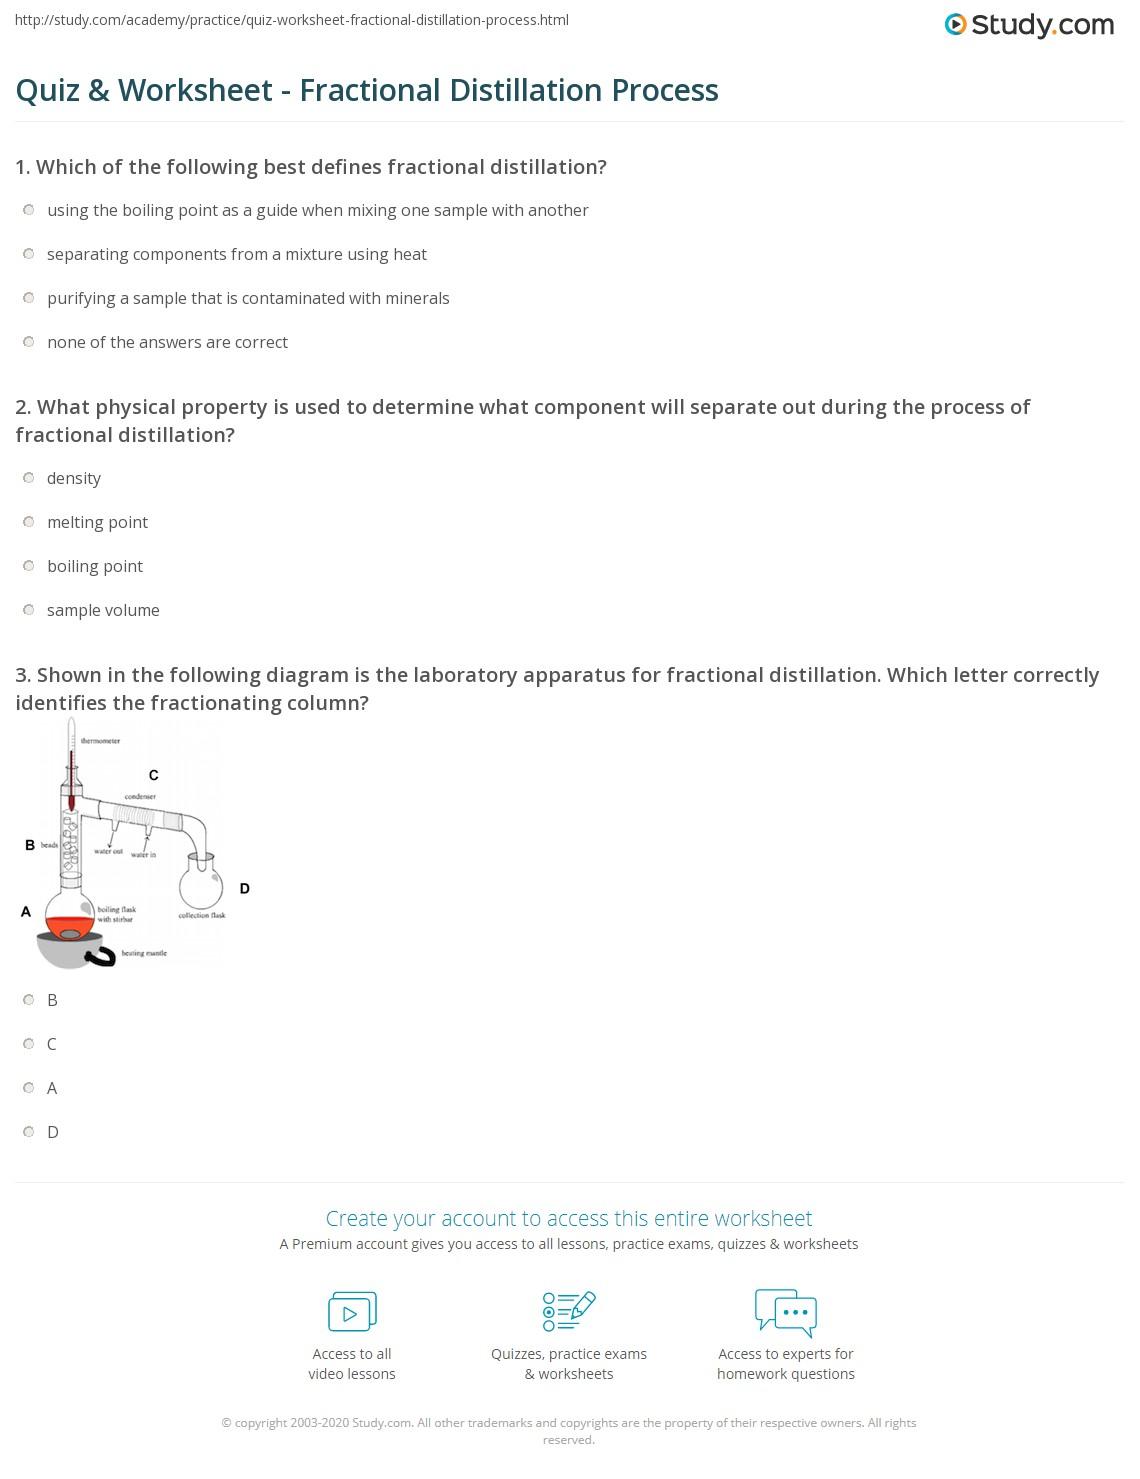 Quiz and Worksheet Fractional Distillation Process – Fractional Distillation Worksheet